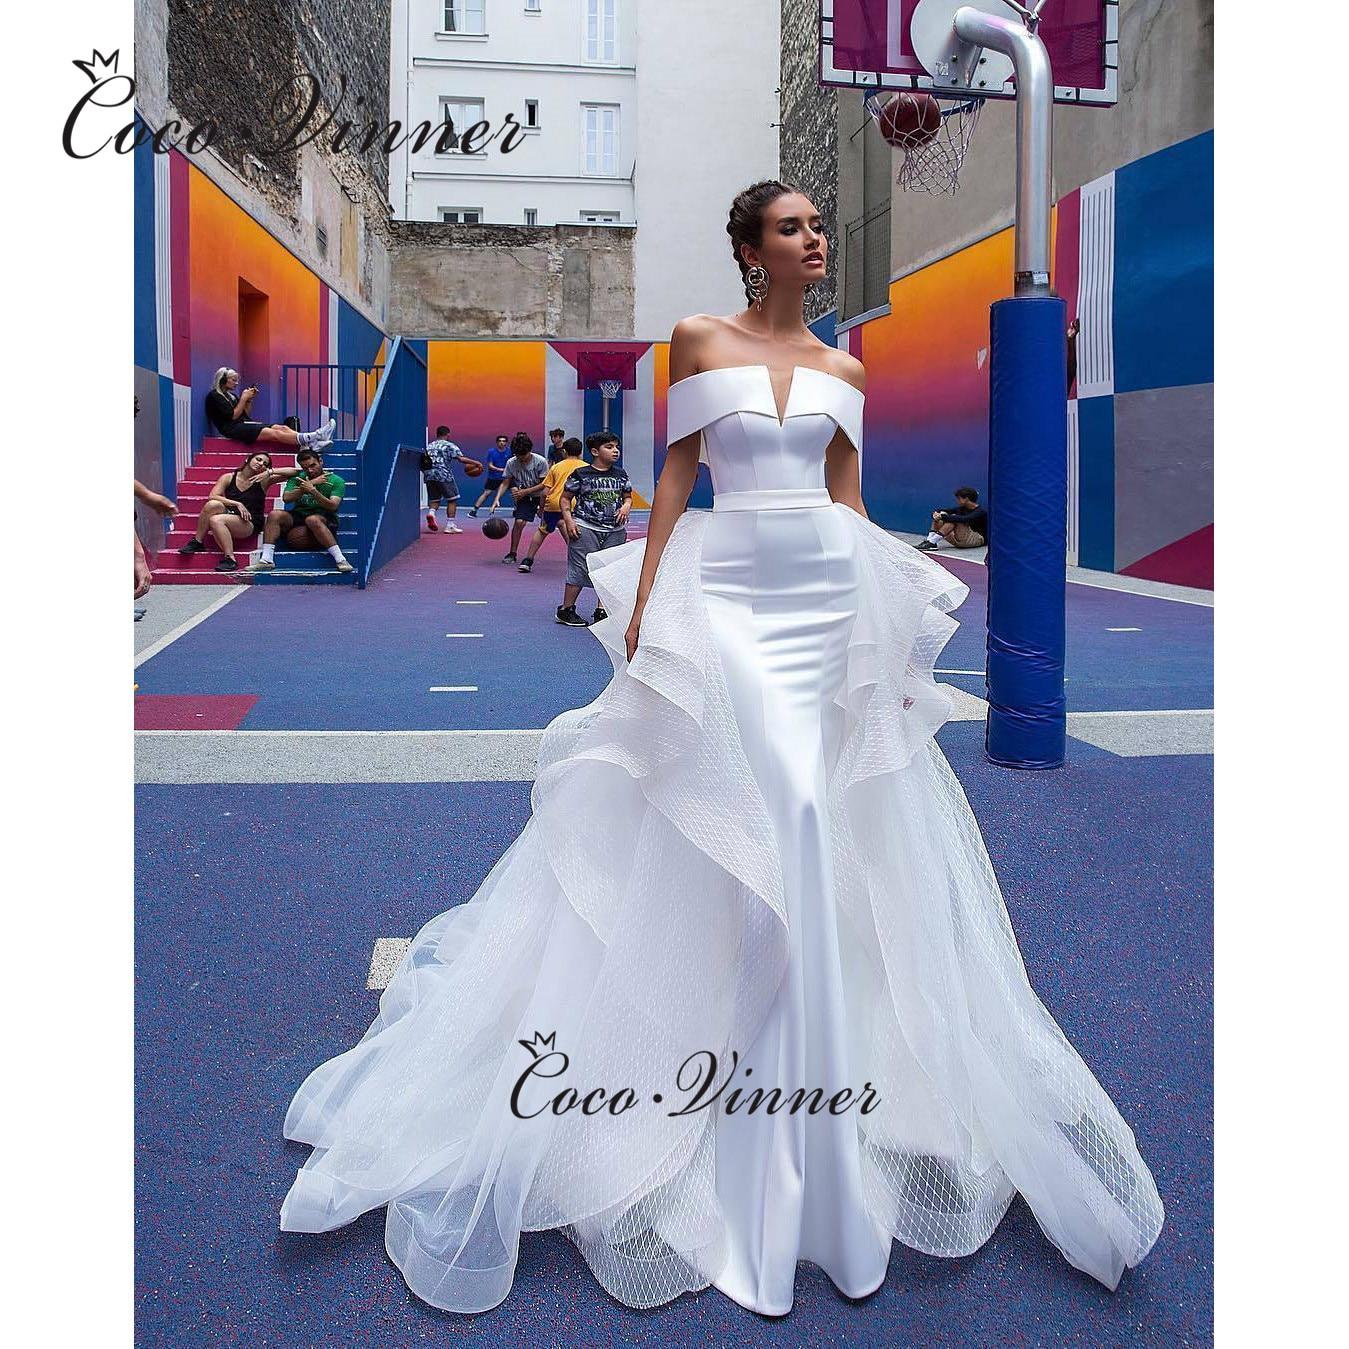 Special V-neck Organza Mermaid Wedding Dresses Lustrous Satin Sashes Elegant Pure White свадебное короткое платье W0522